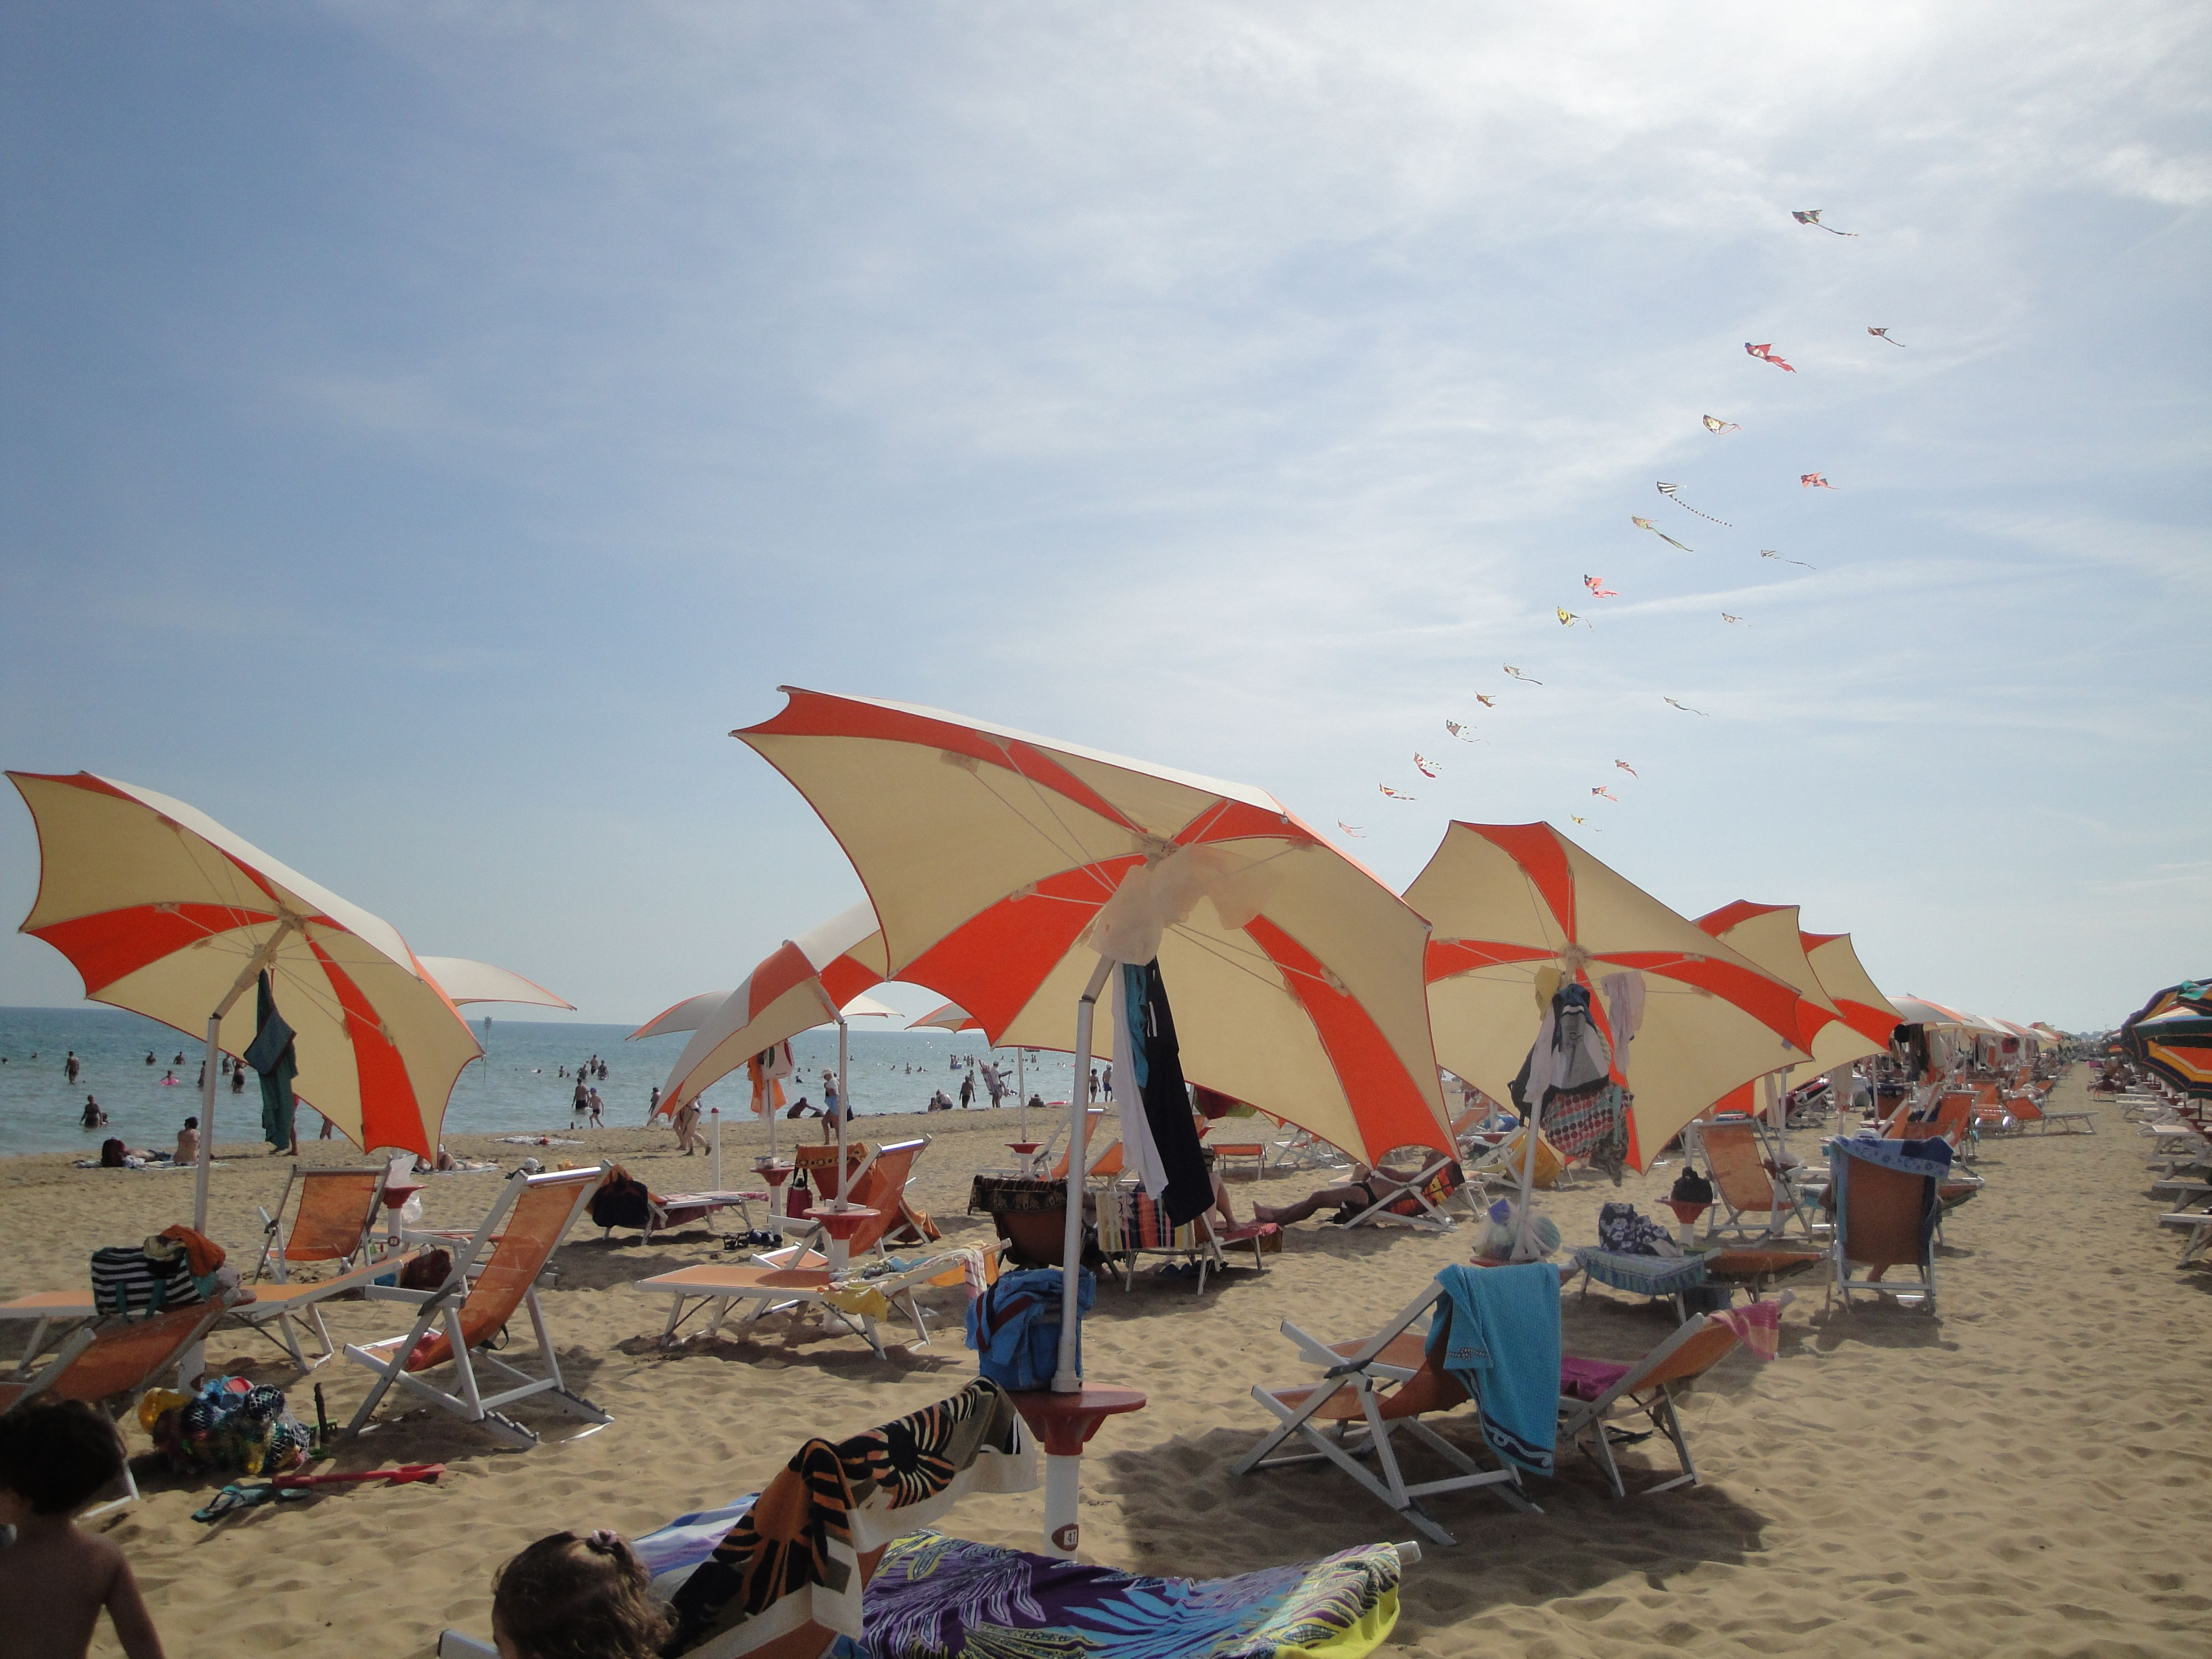 Комплект зонт+два лежака на номер бесплатно в Бибионе